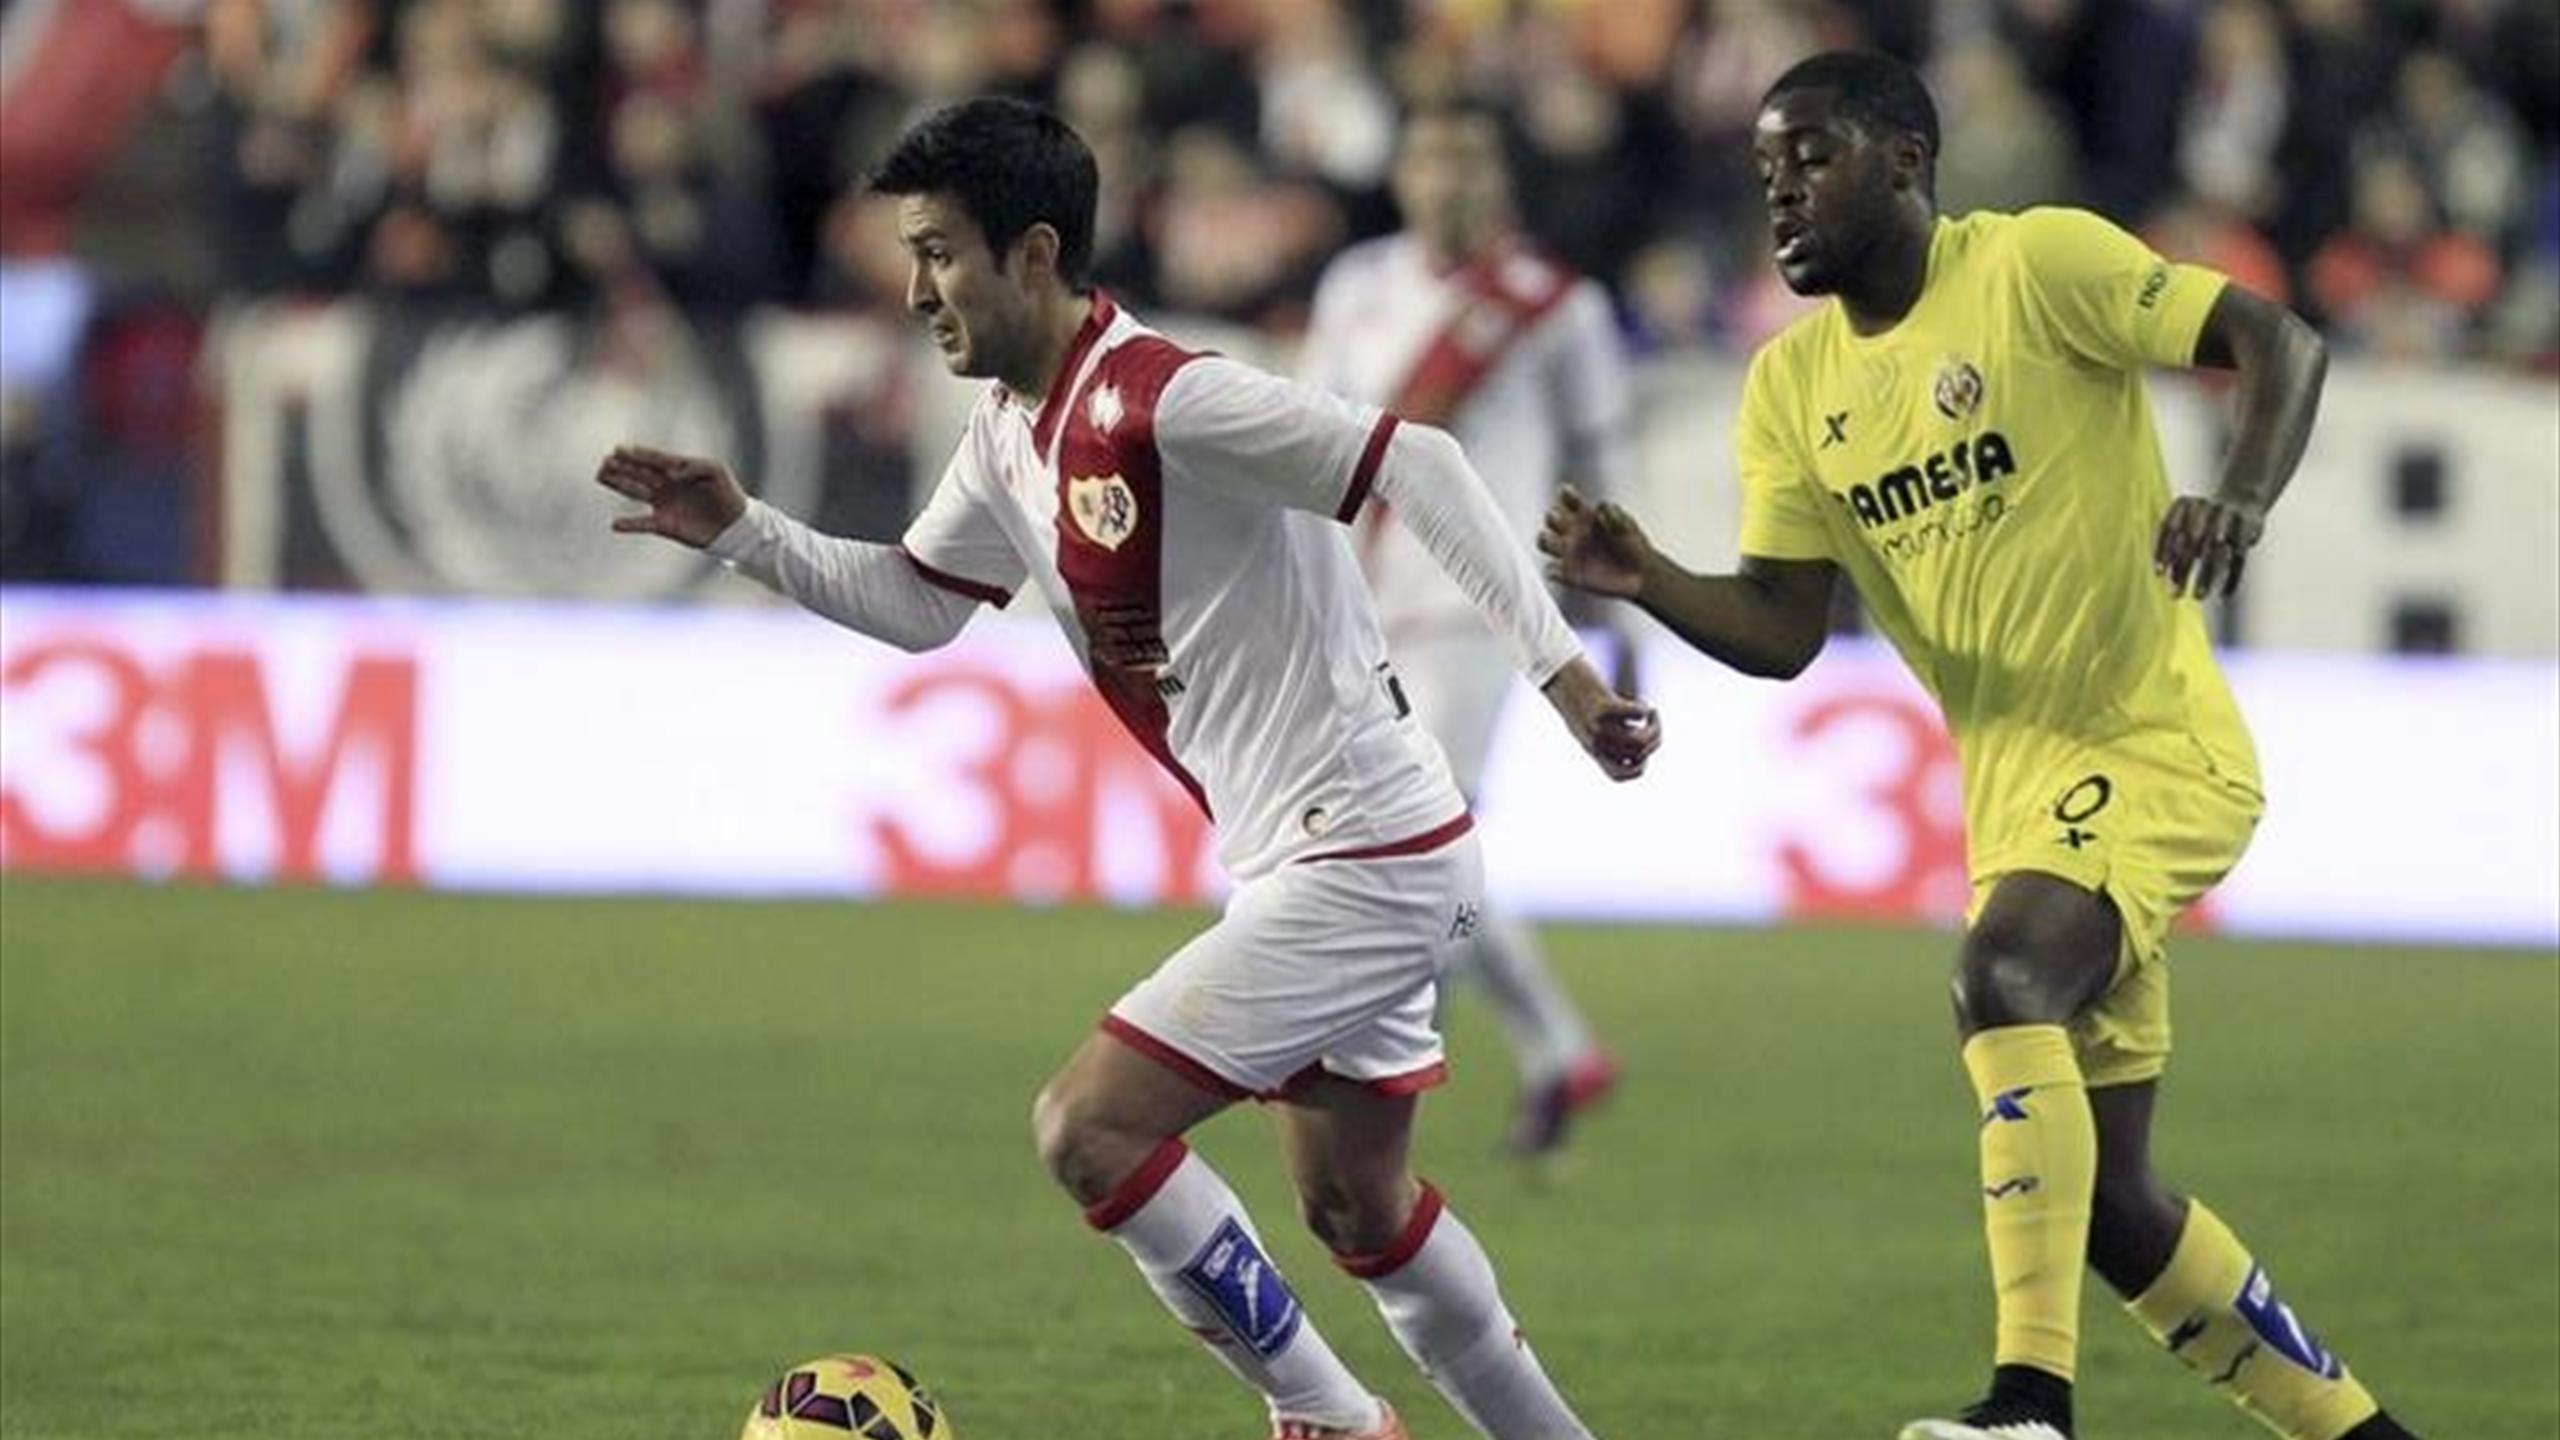 Video: Rayo Vallecano vs Villarreal